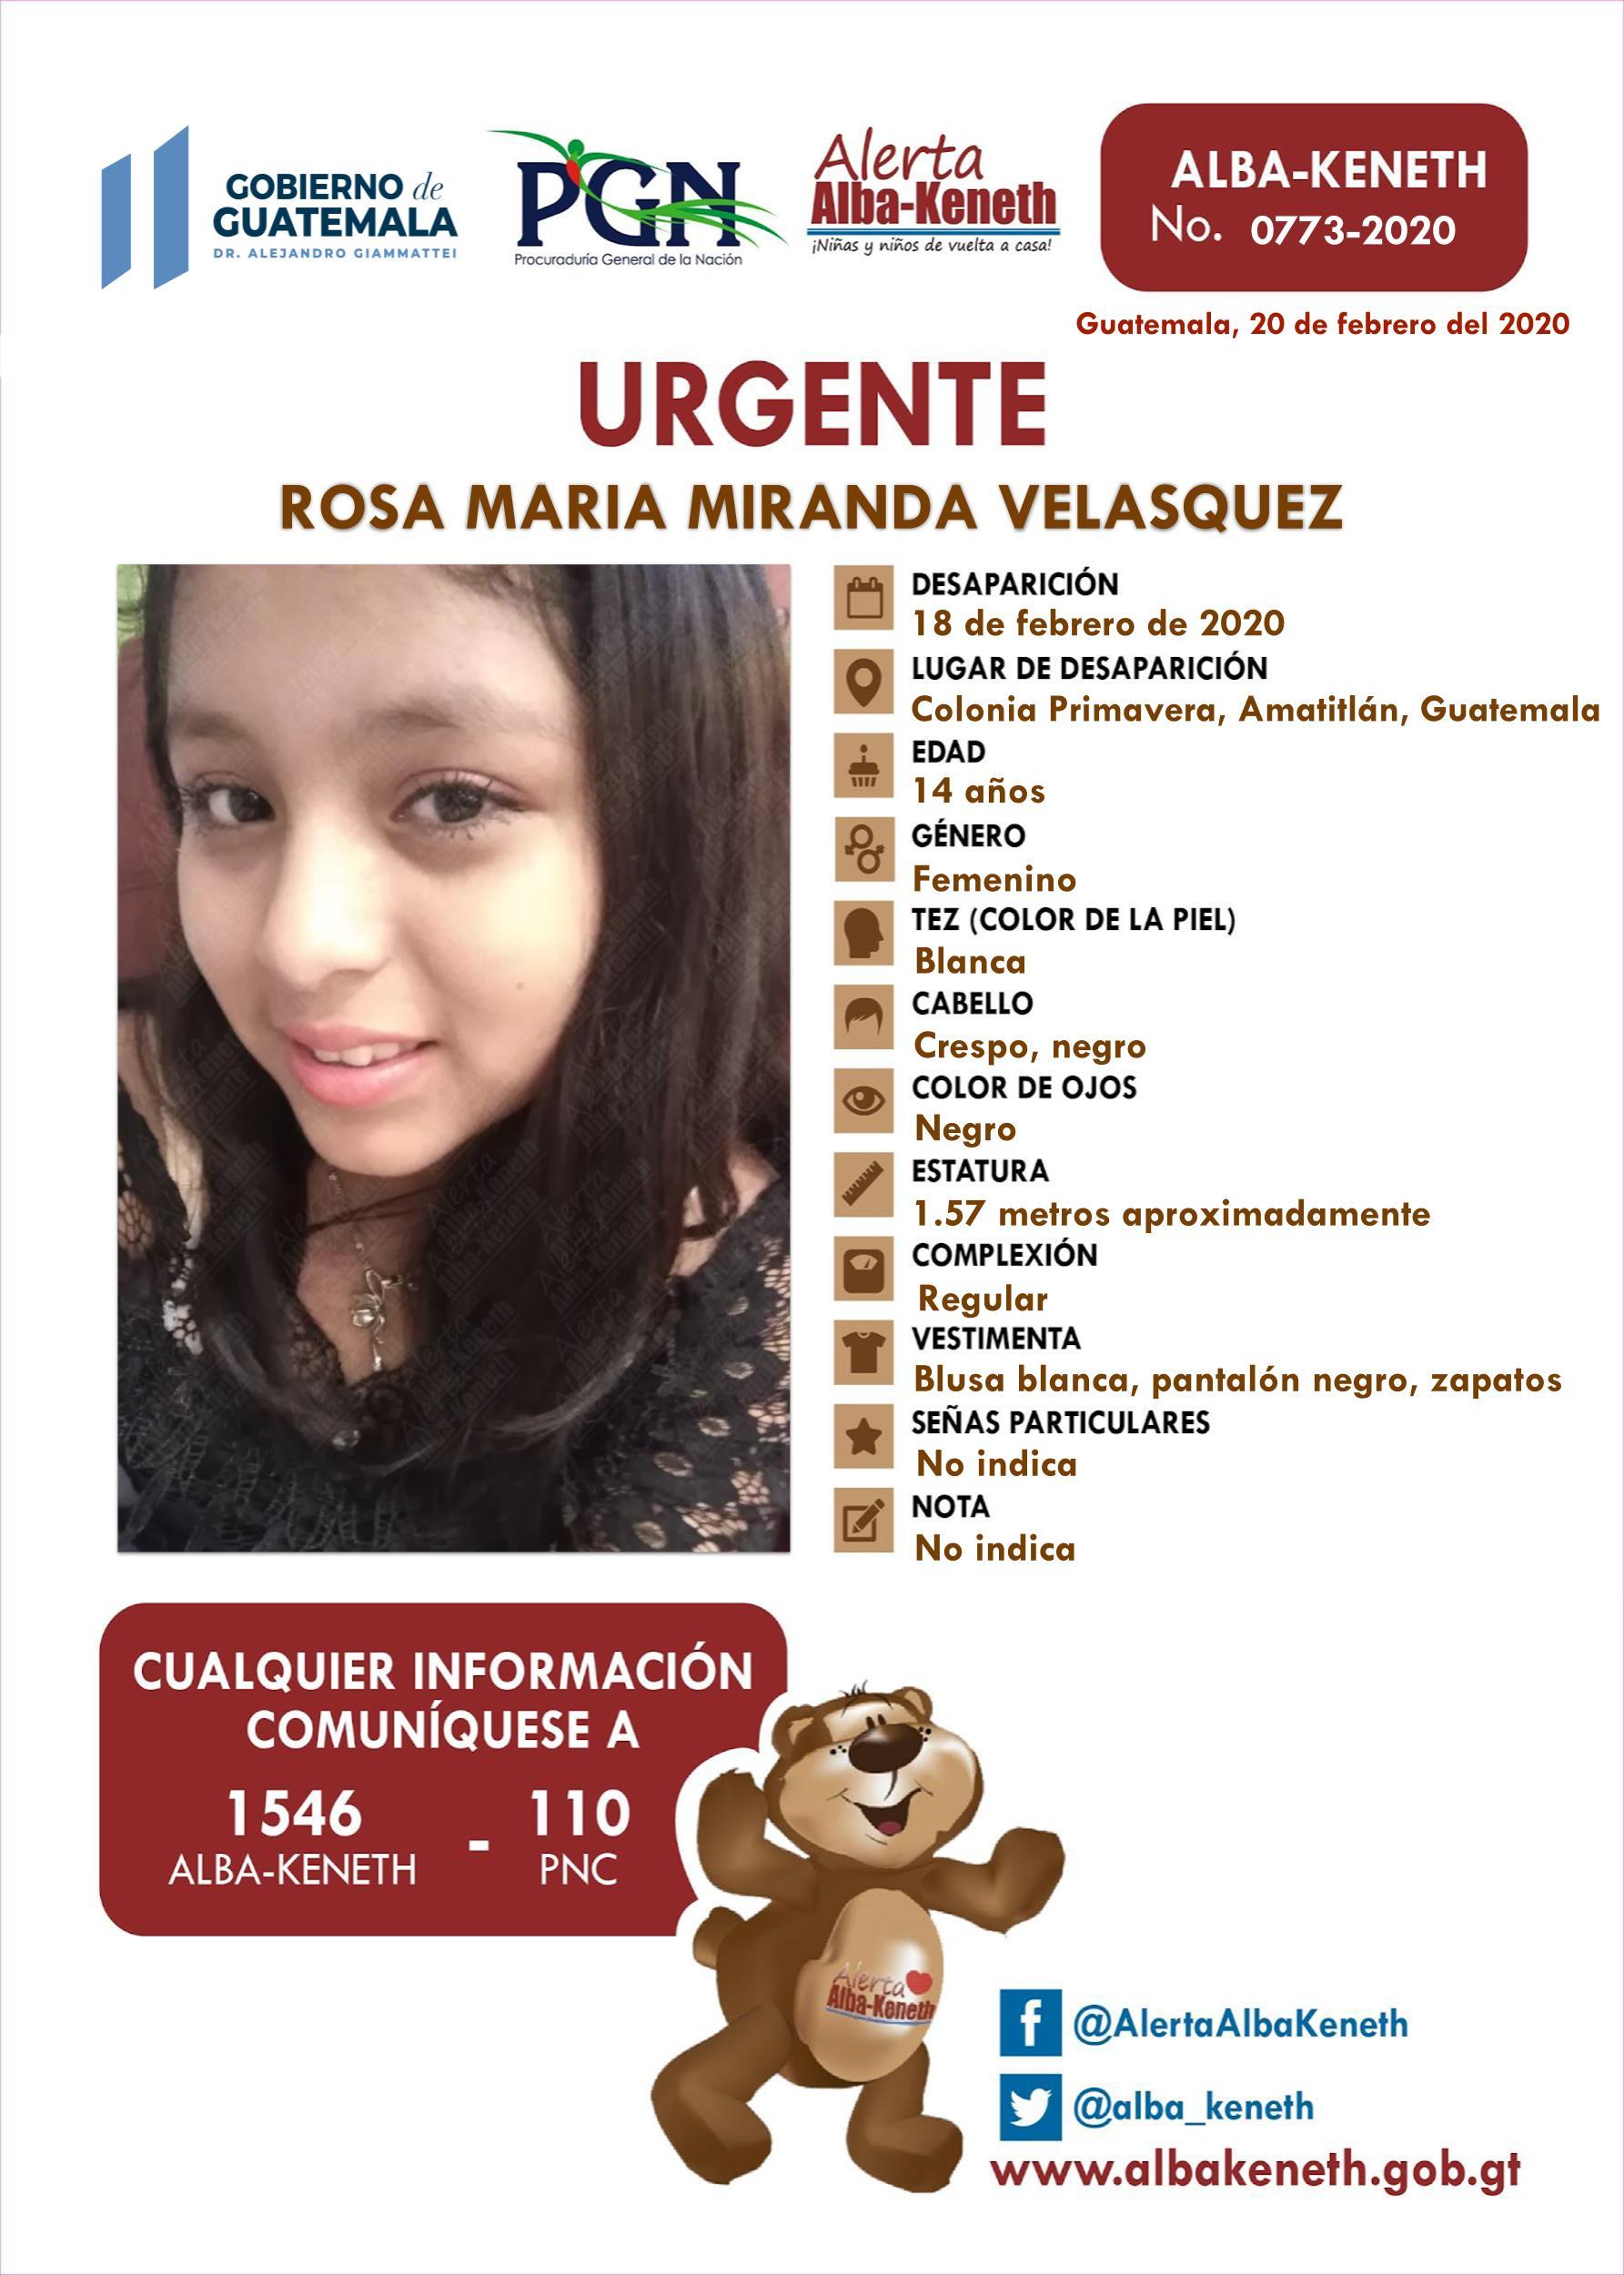 Rosa Maria Miranda Velasquez